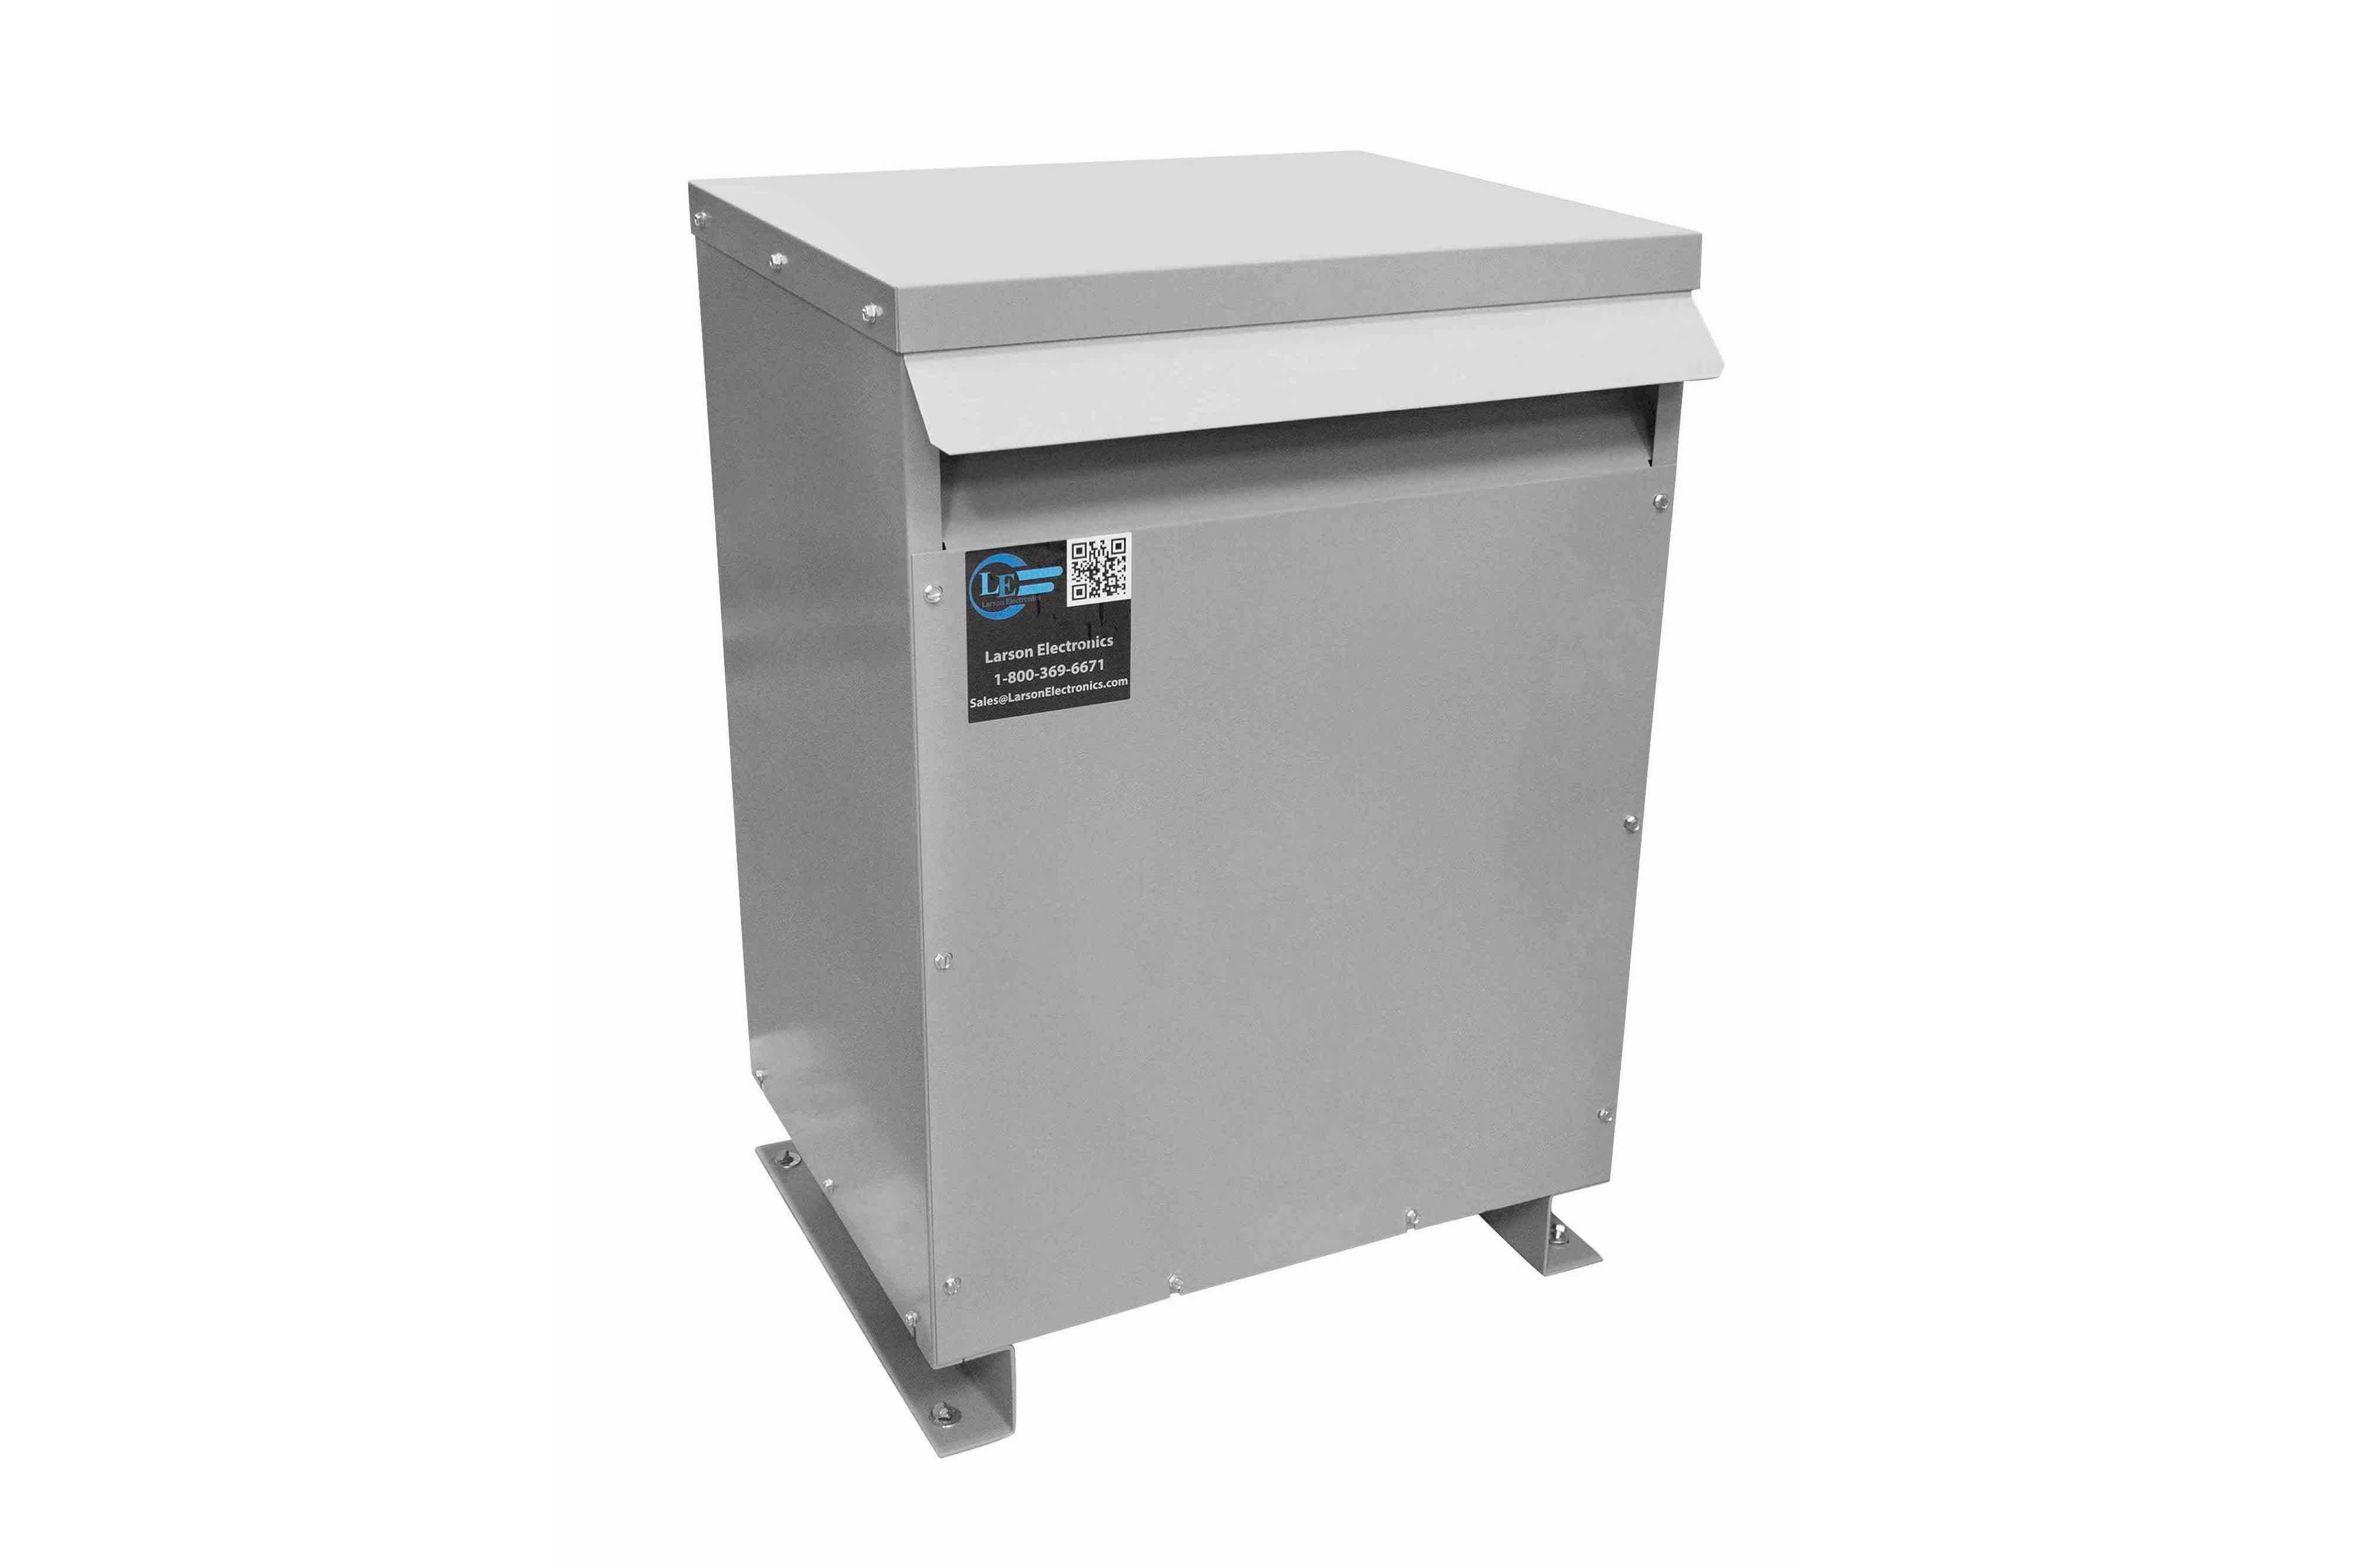 37.5 kVA 3PH Isolation Transformer, 575V Wye Primary, 480Y/277 Wye-N Secondary, N3R, Ventilated, 60 Hz